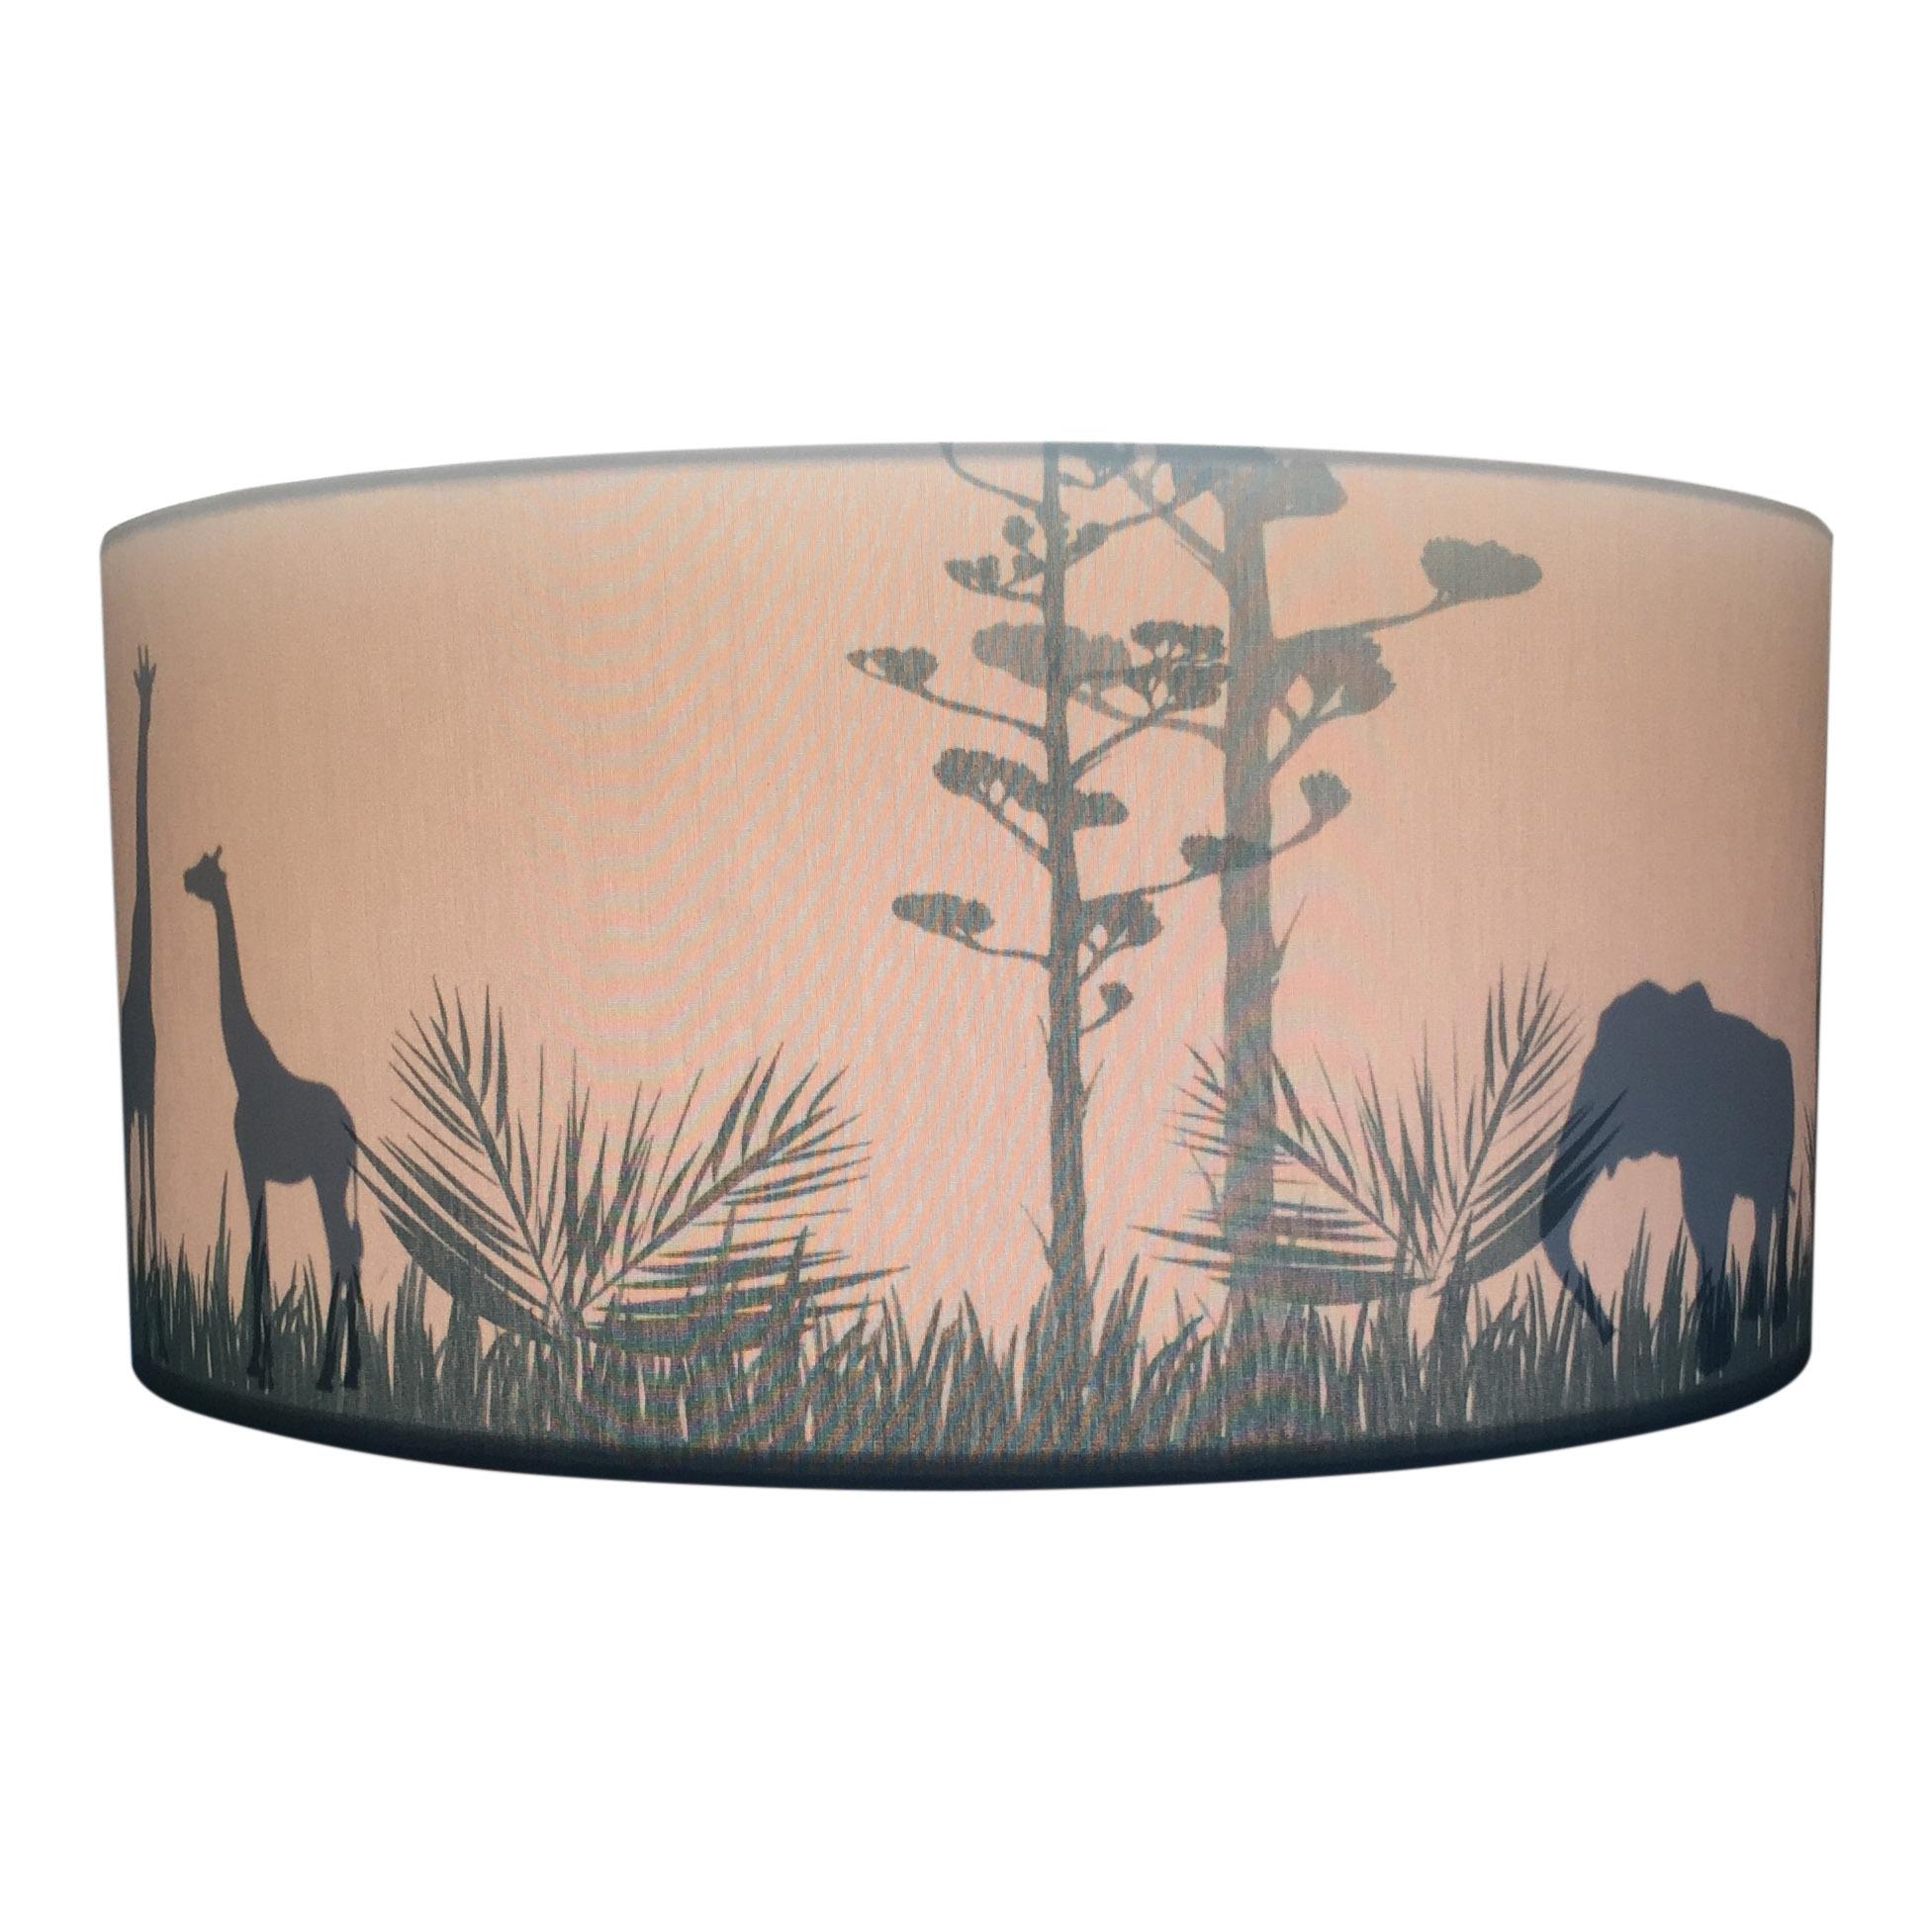 Hanglamp Voor Jongenskamer.Lamp Kinderkamer Safari Silhouette Camel Prachtige Safari